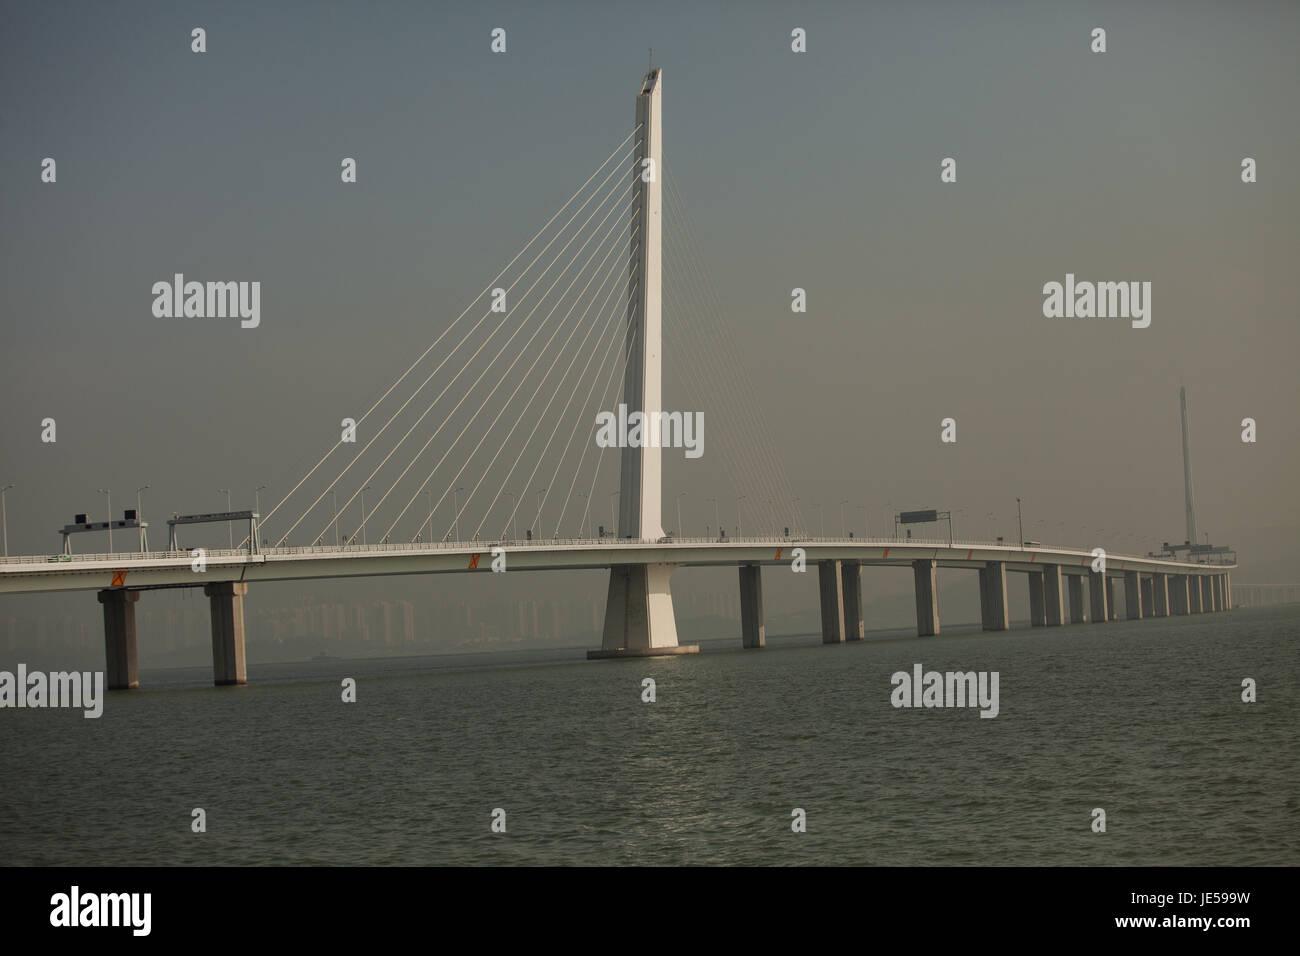 Shenzhen bay bridge, connecting Hong Kong SAR with mainland China, city of Shenzhen, Guangdong province, People's - Stock Image